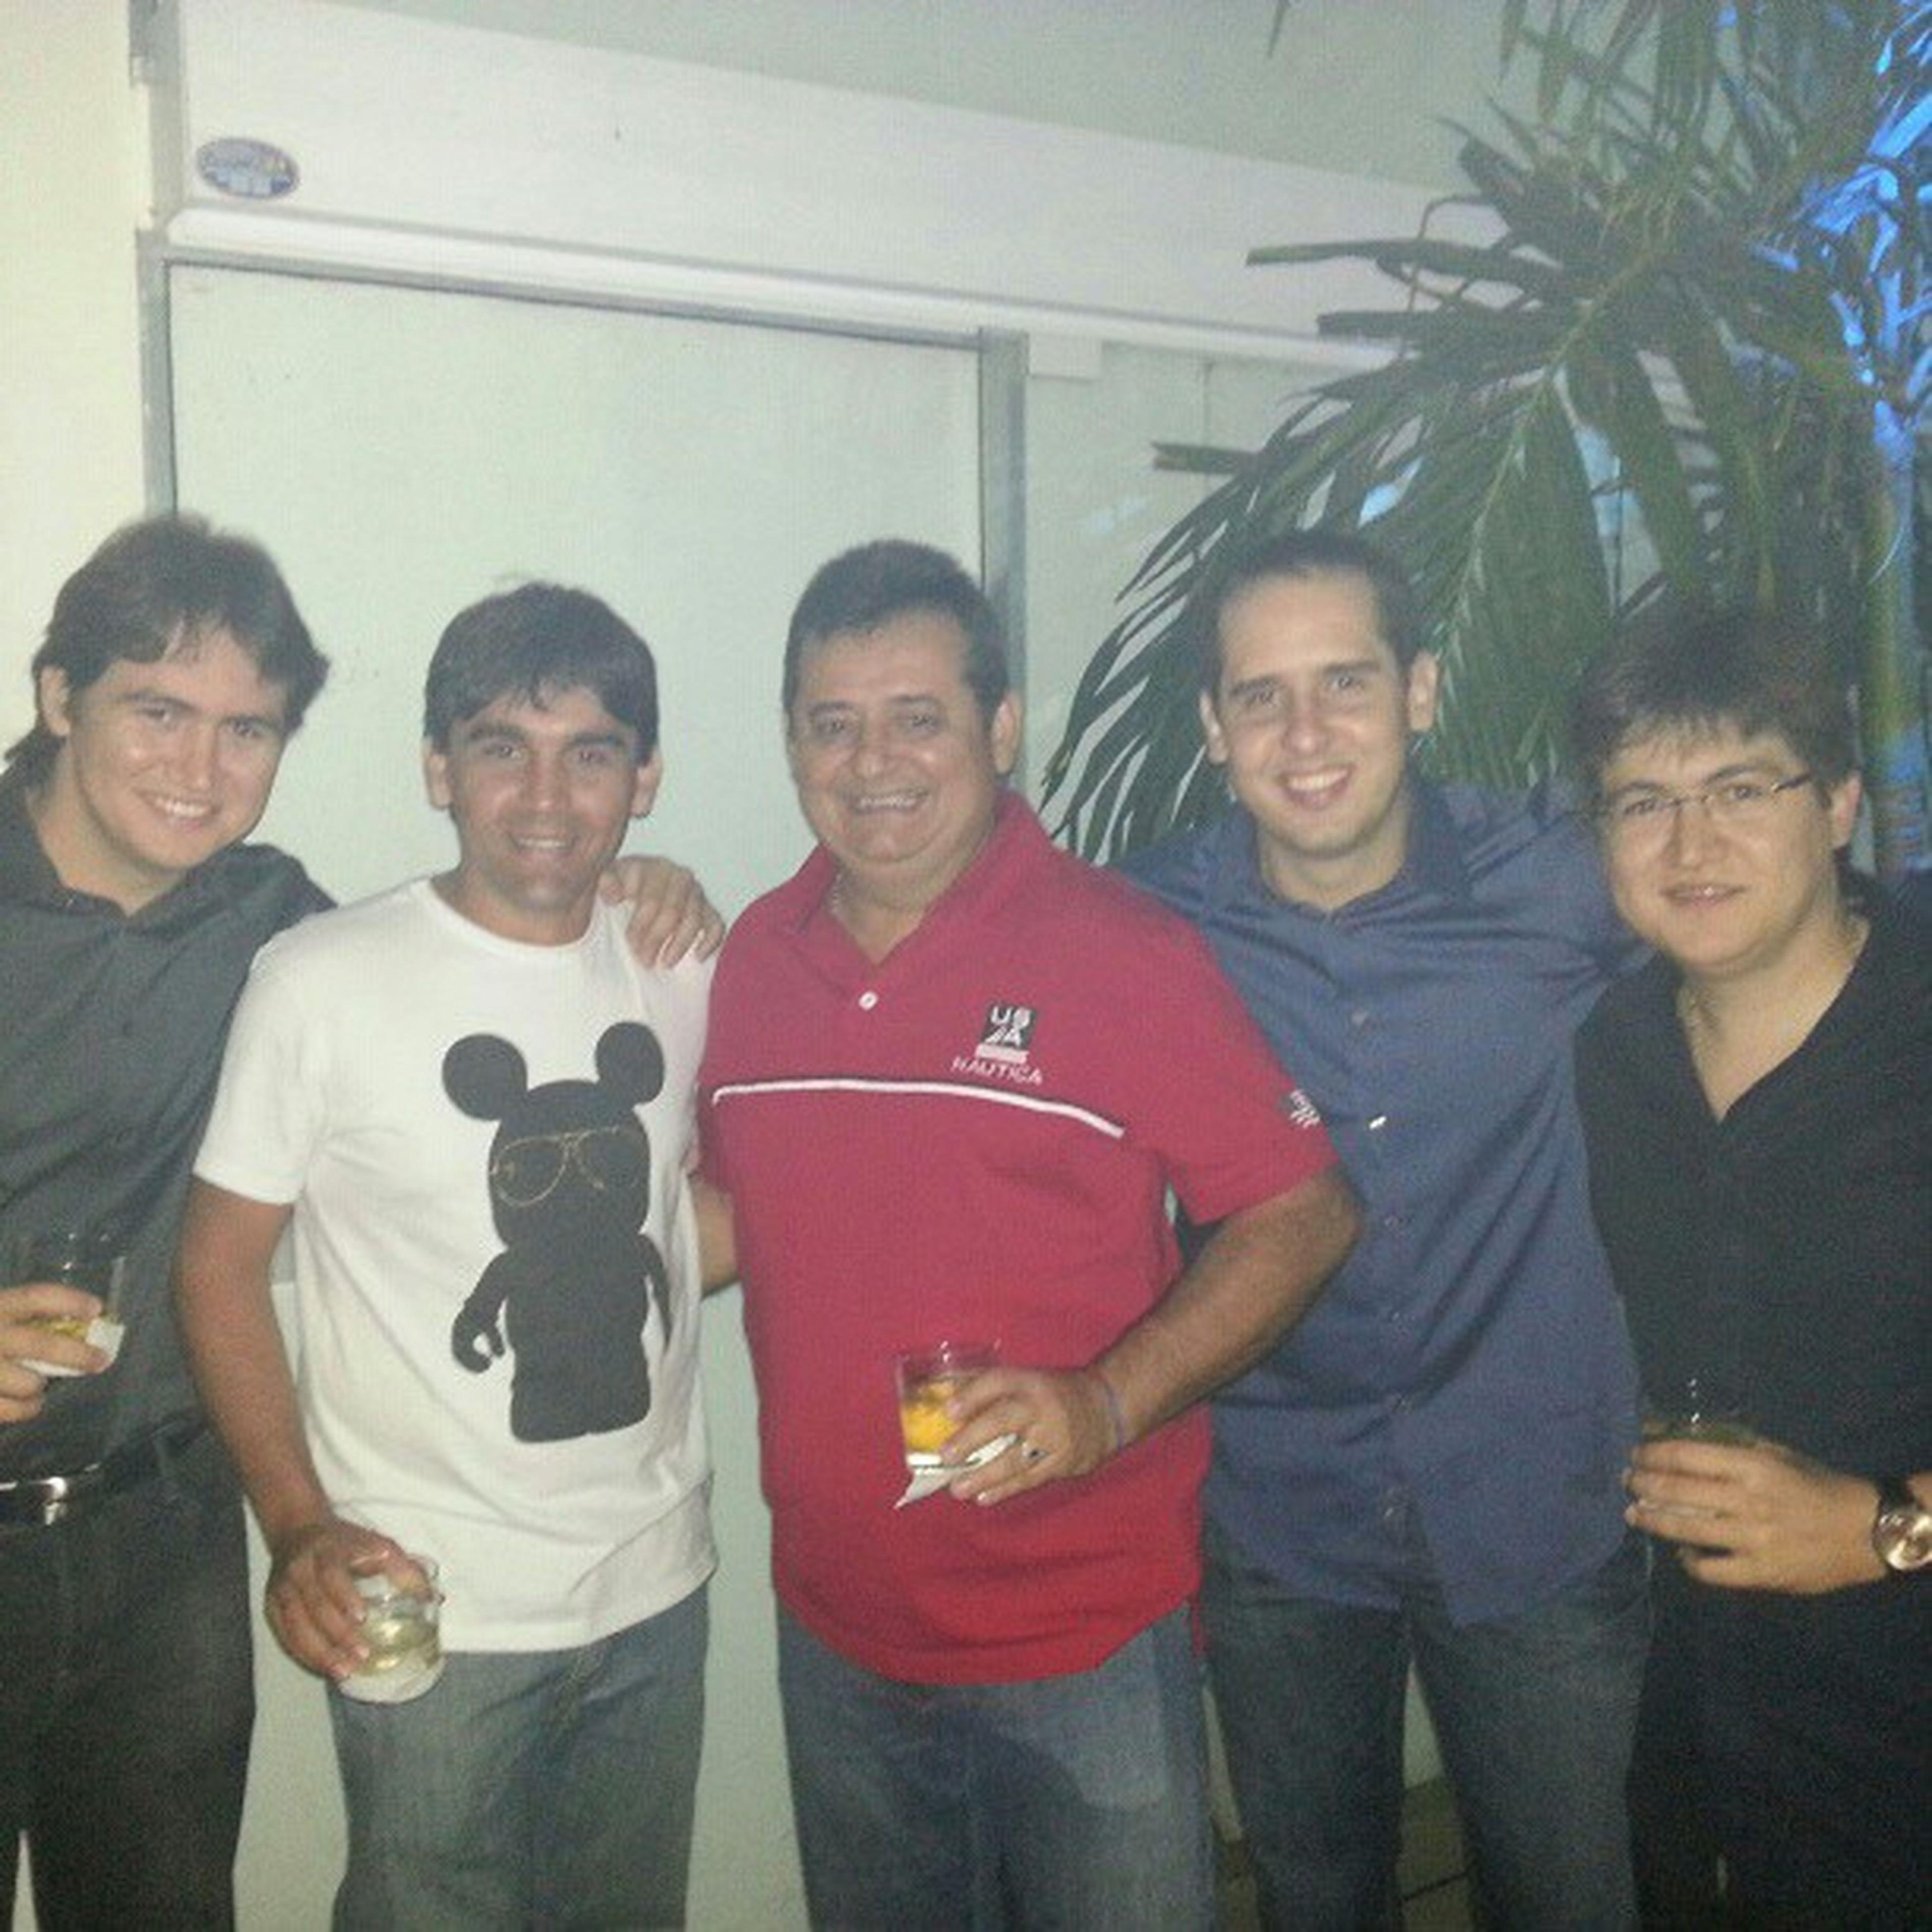 @diegolgoliveira @thiagotarta @kakatp @mariovilany . Party Instanight Friends